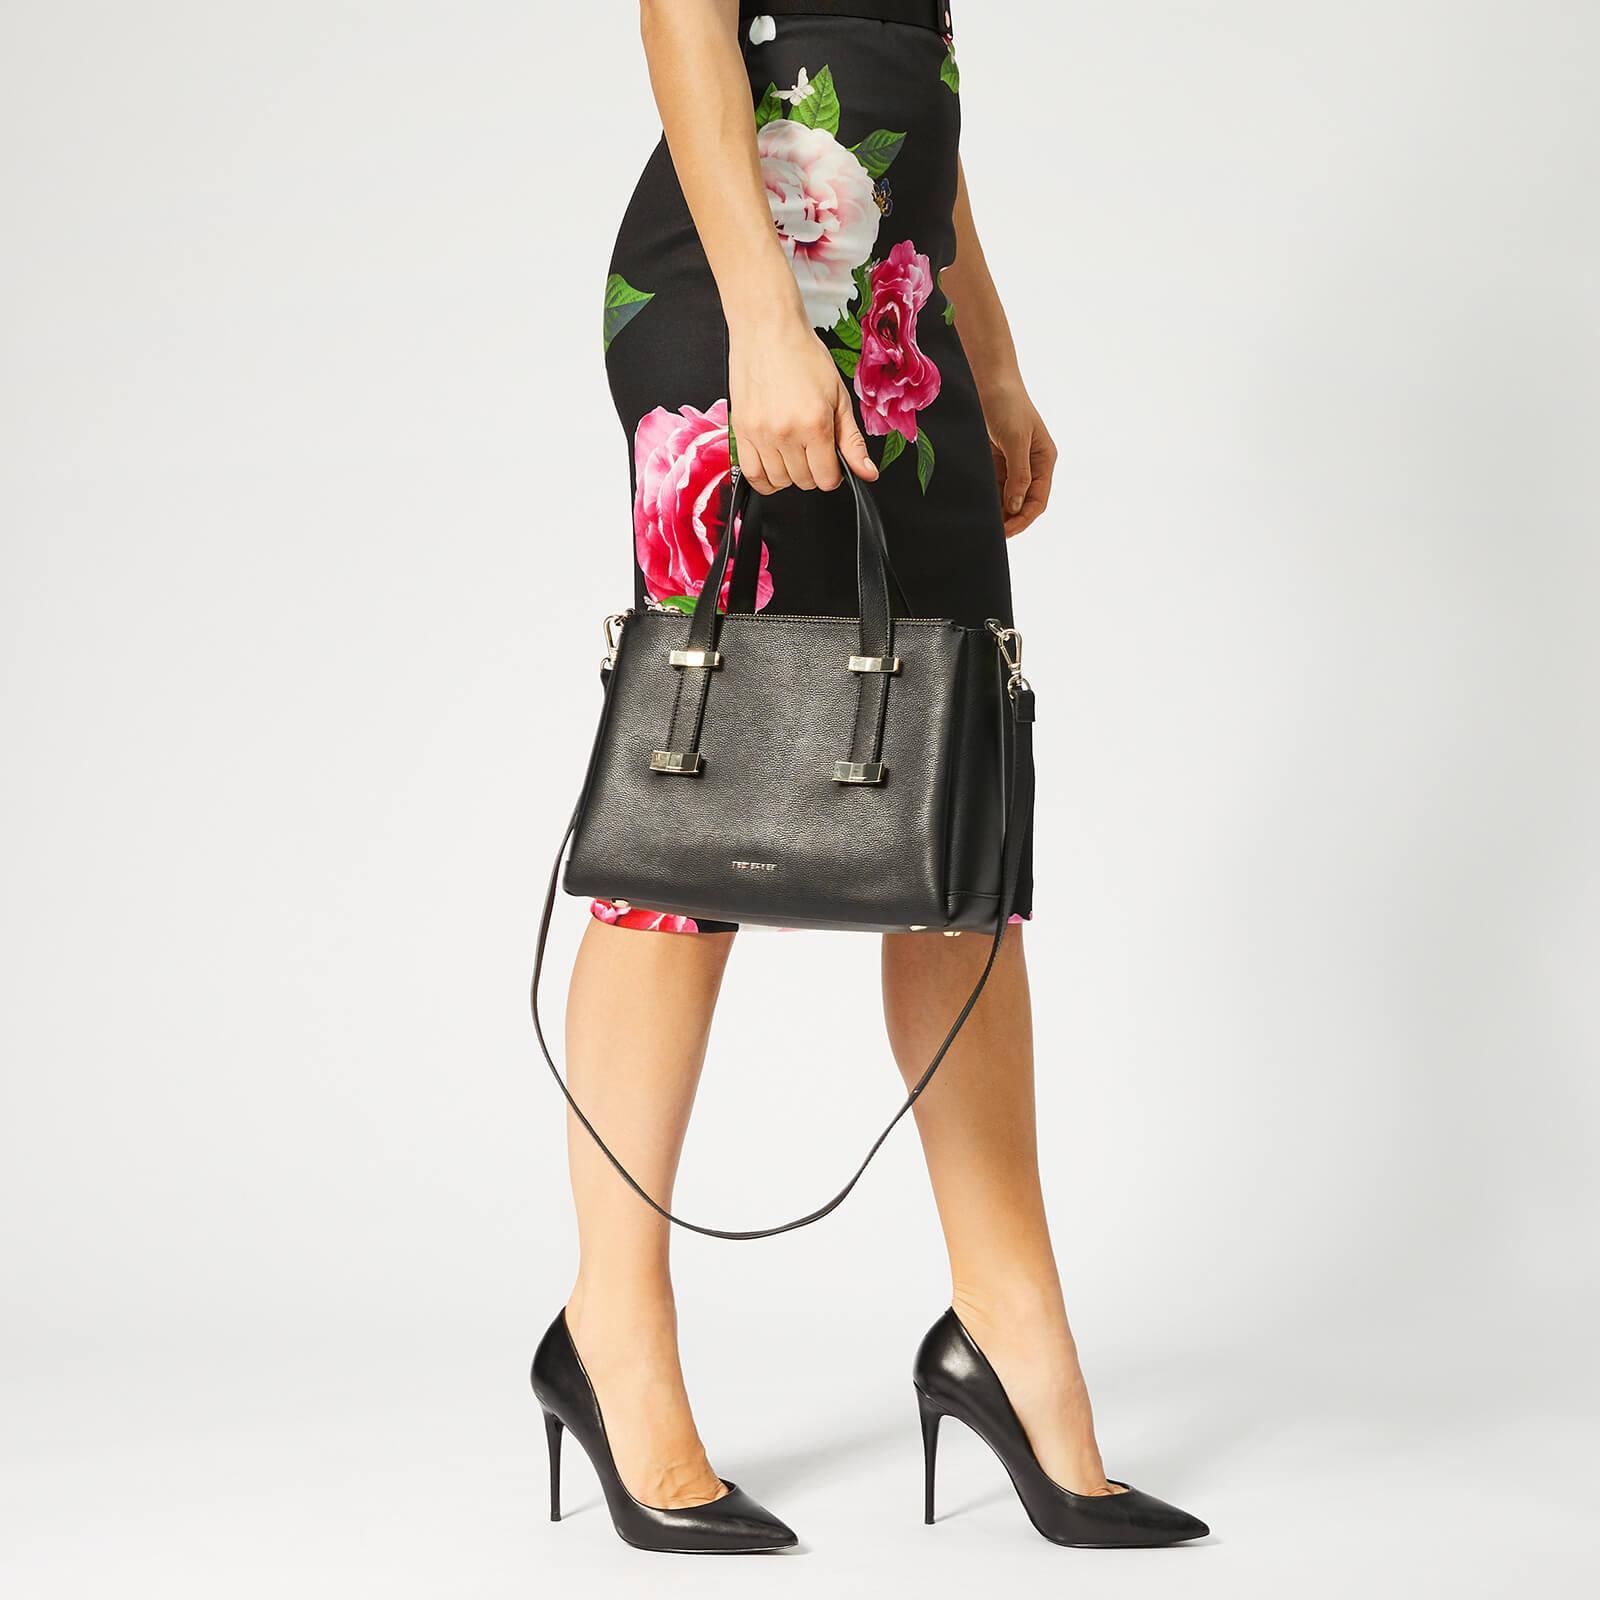 caac0e468b9 Women's Black Julieet Bow Adjustable Handle Small Tote Bag